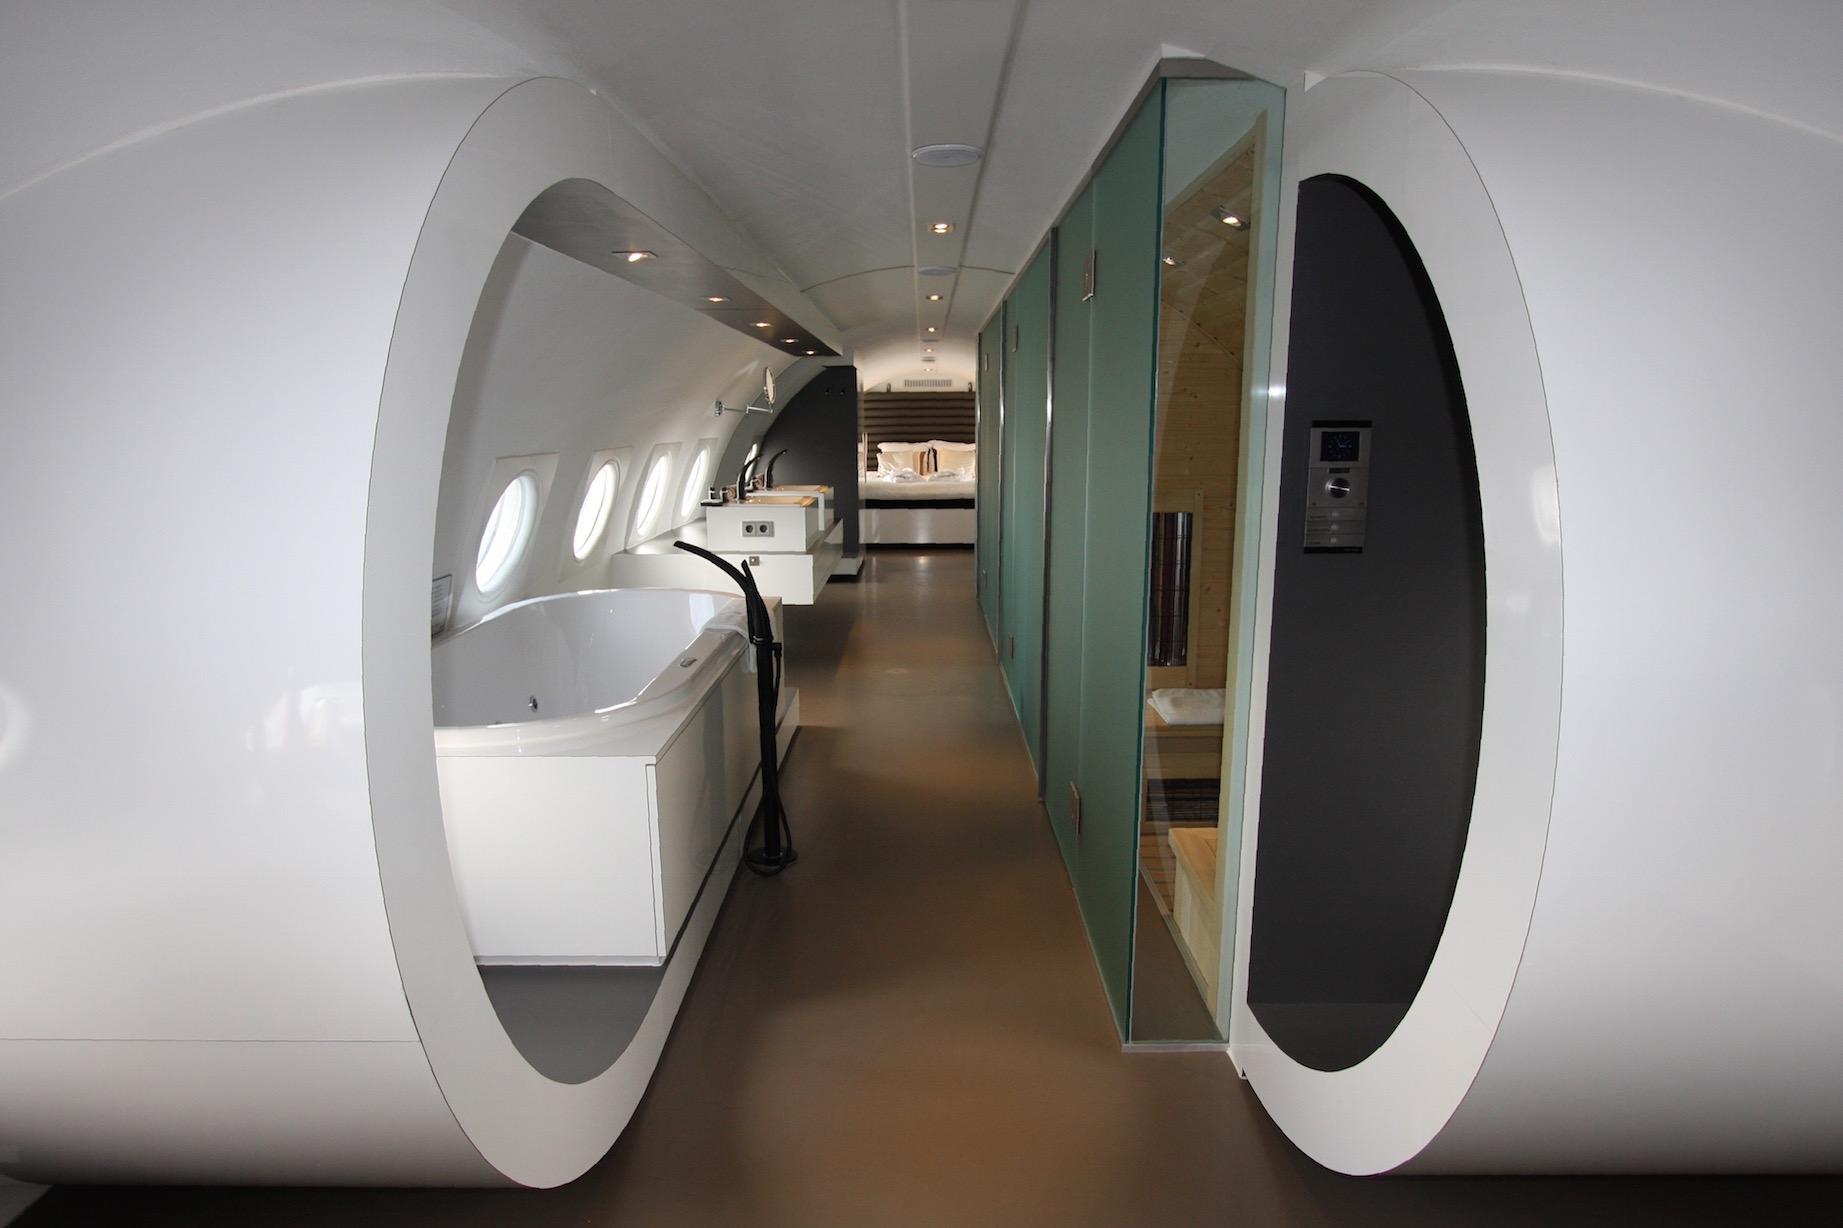 Vliegtuigsuite Vliegtuighotel Teuge